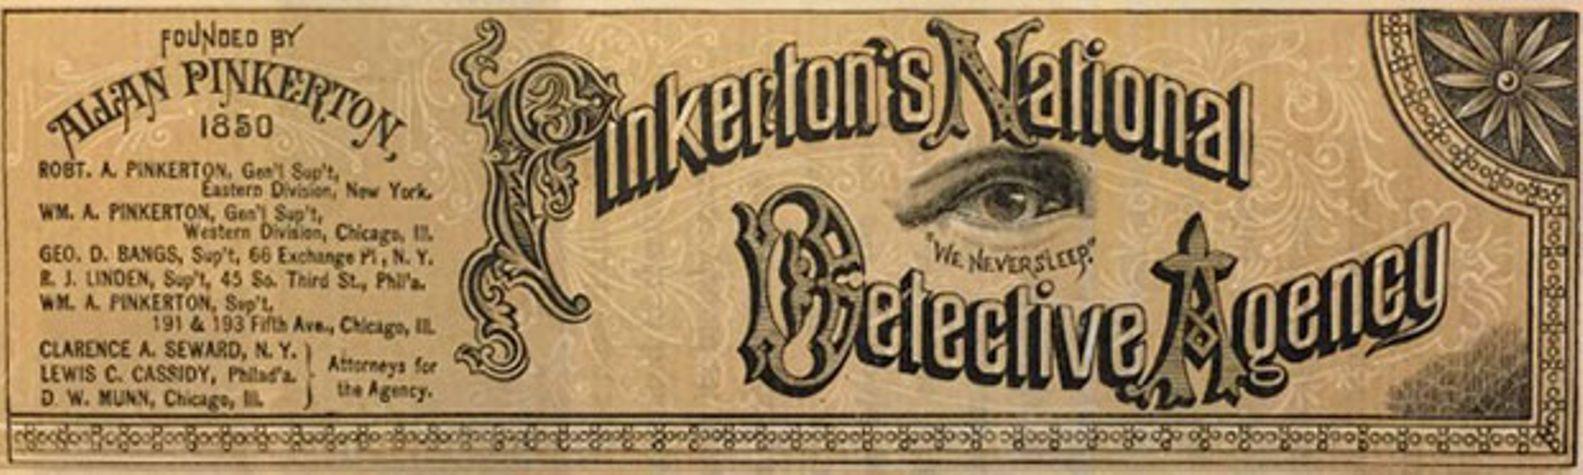 pinkerton's national detective agency logo